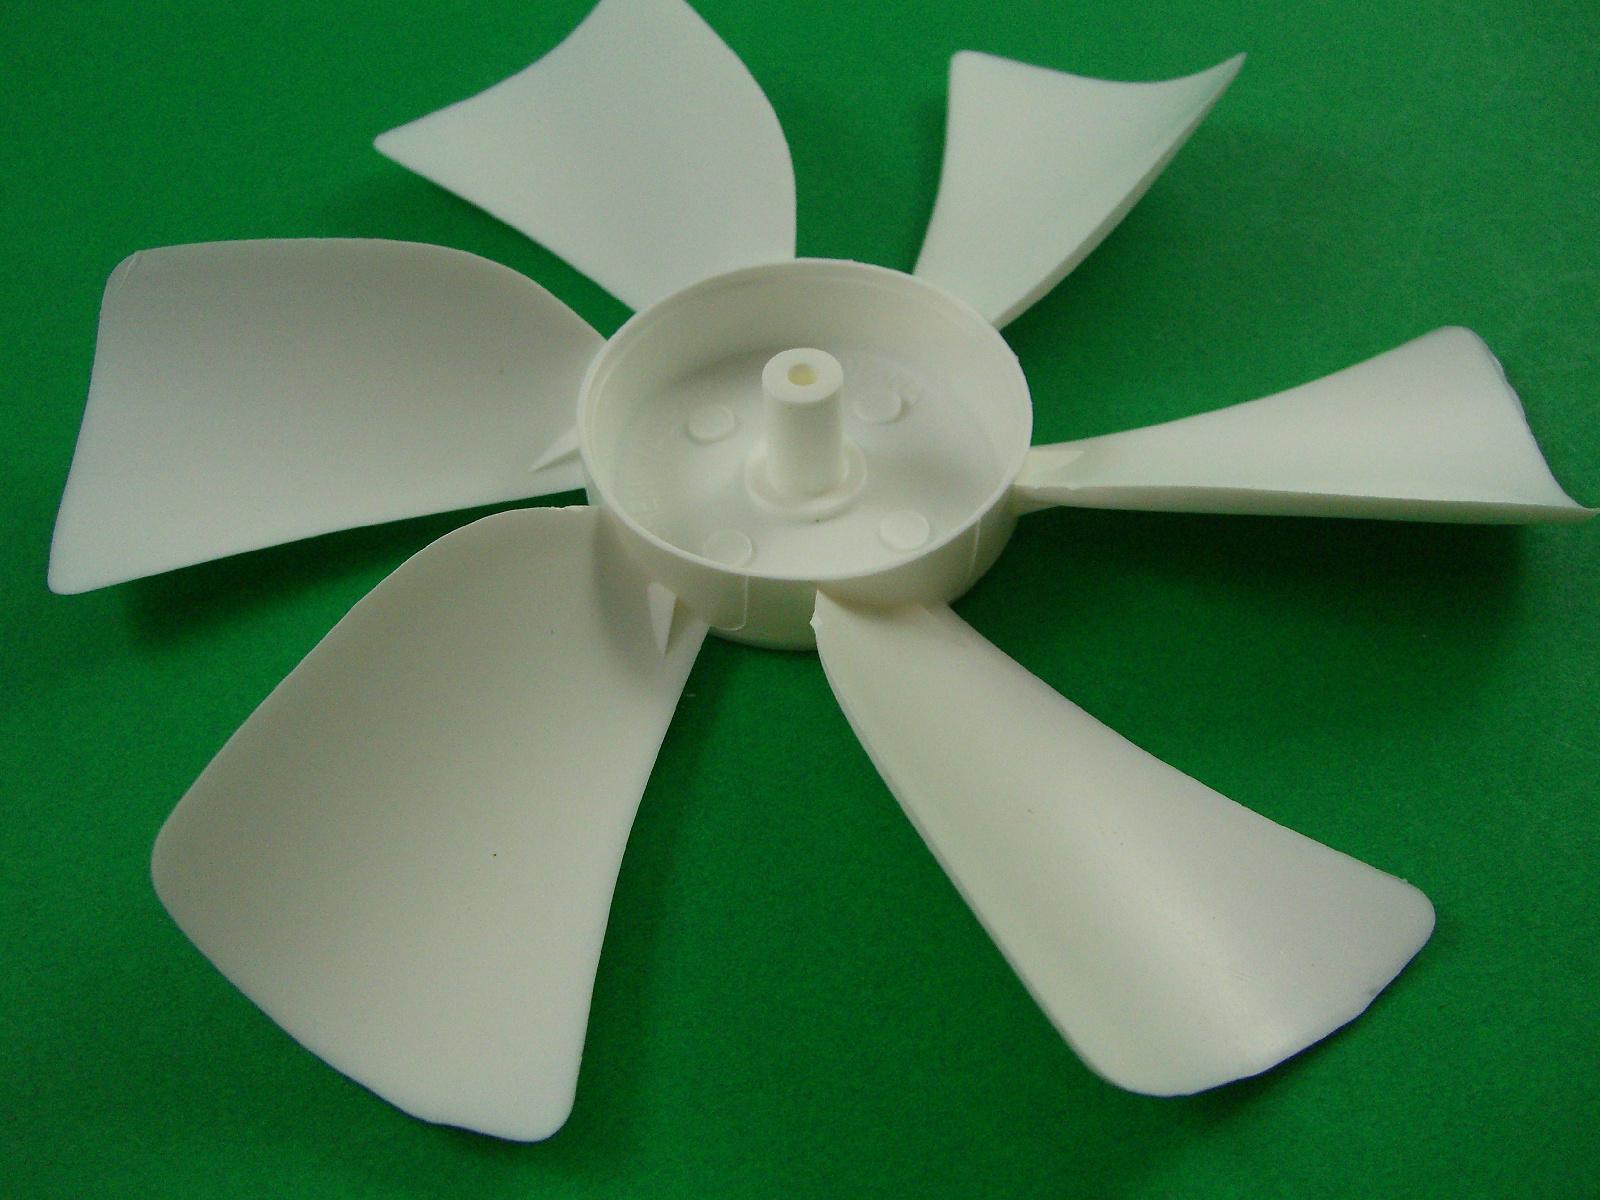 Ventline Bvd0215 00 Rv Power Roof Vent 6 Inch Fan Blade